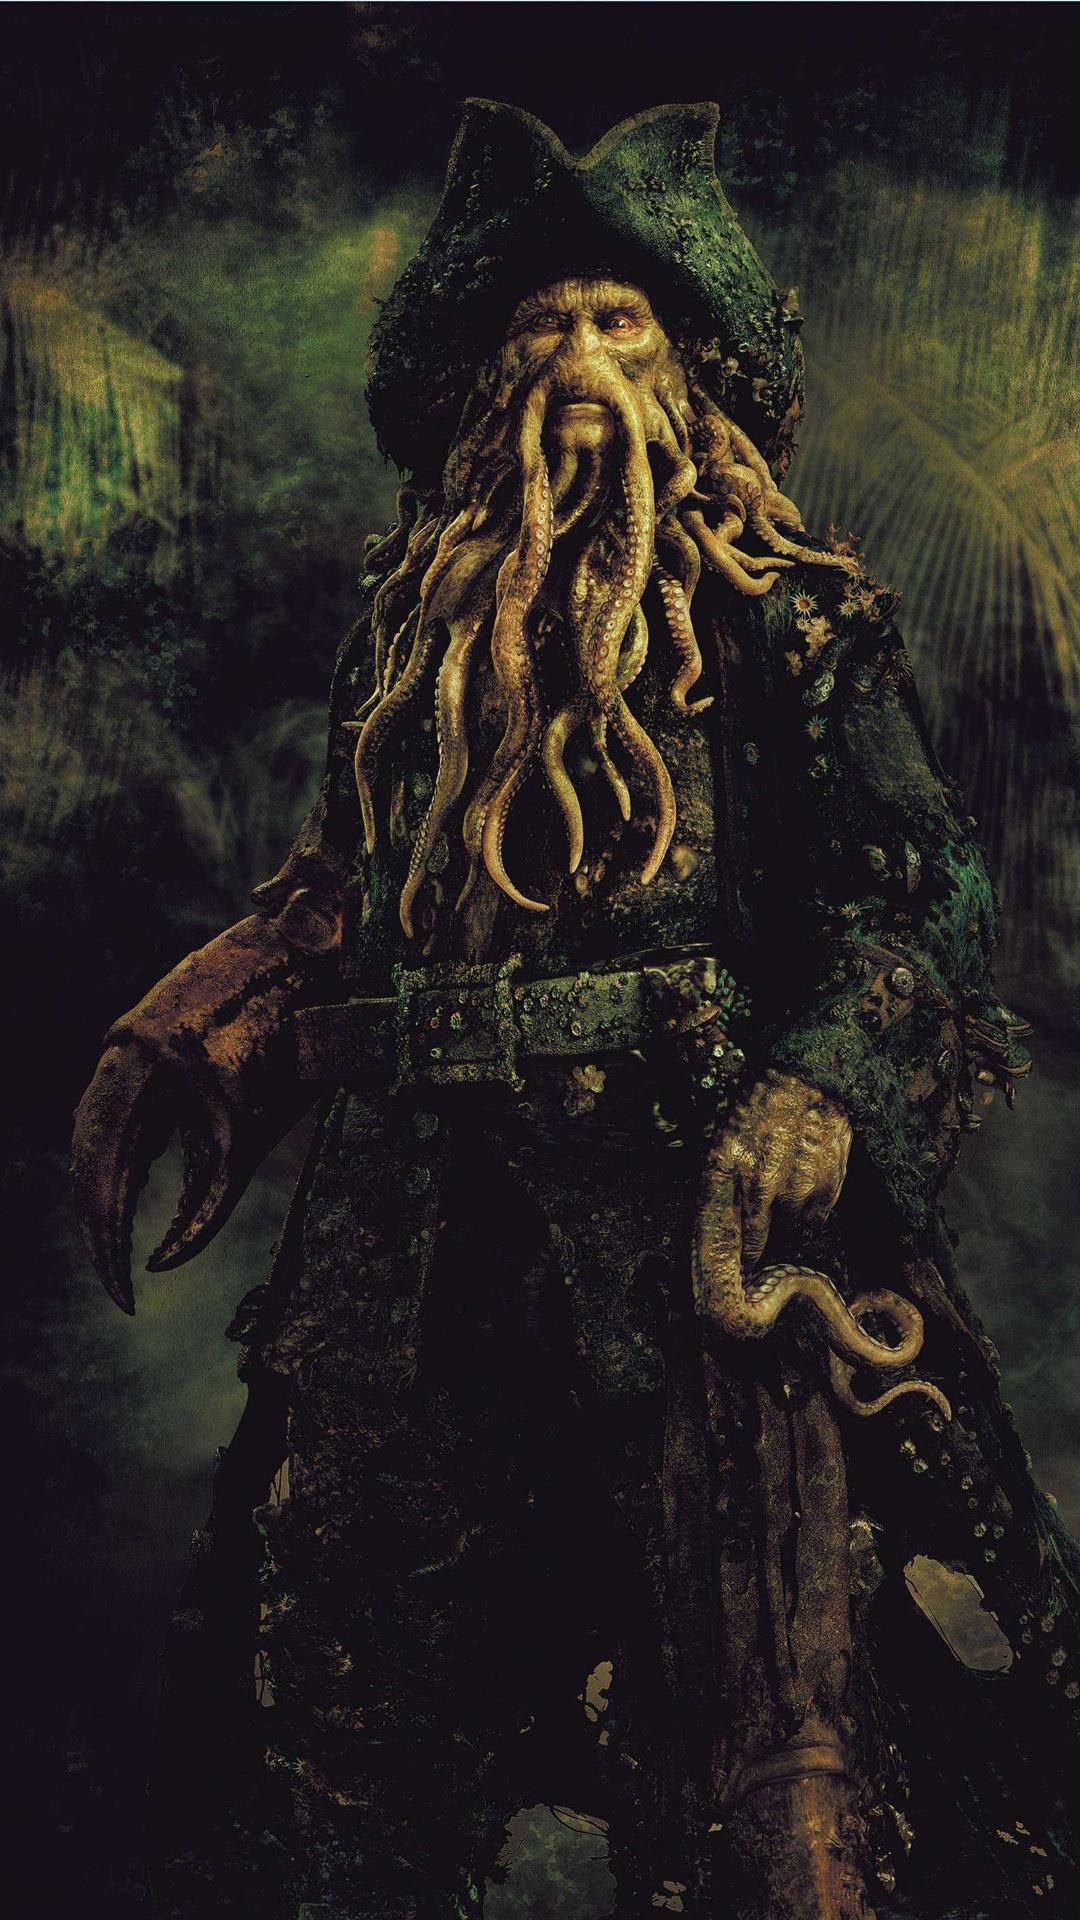 Davy Jones – Pirates of the Caribbean Wallpaper